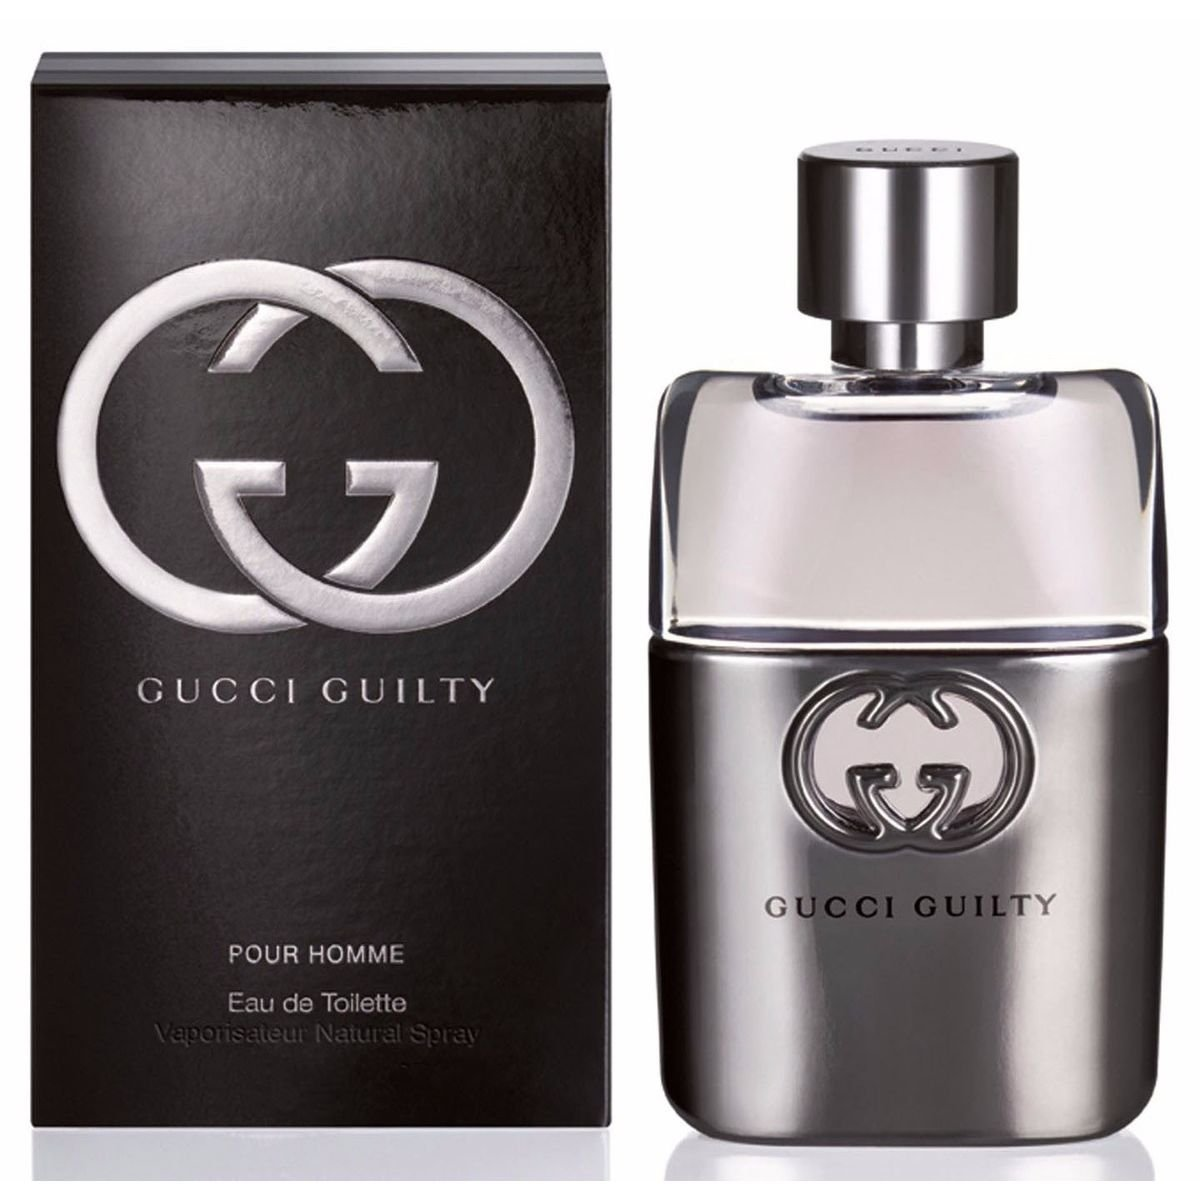 95493b9441 Gucci Guilty Eau for Men Eau De Toilette Spray 90 ml: Amazon.co.uk: Beauty